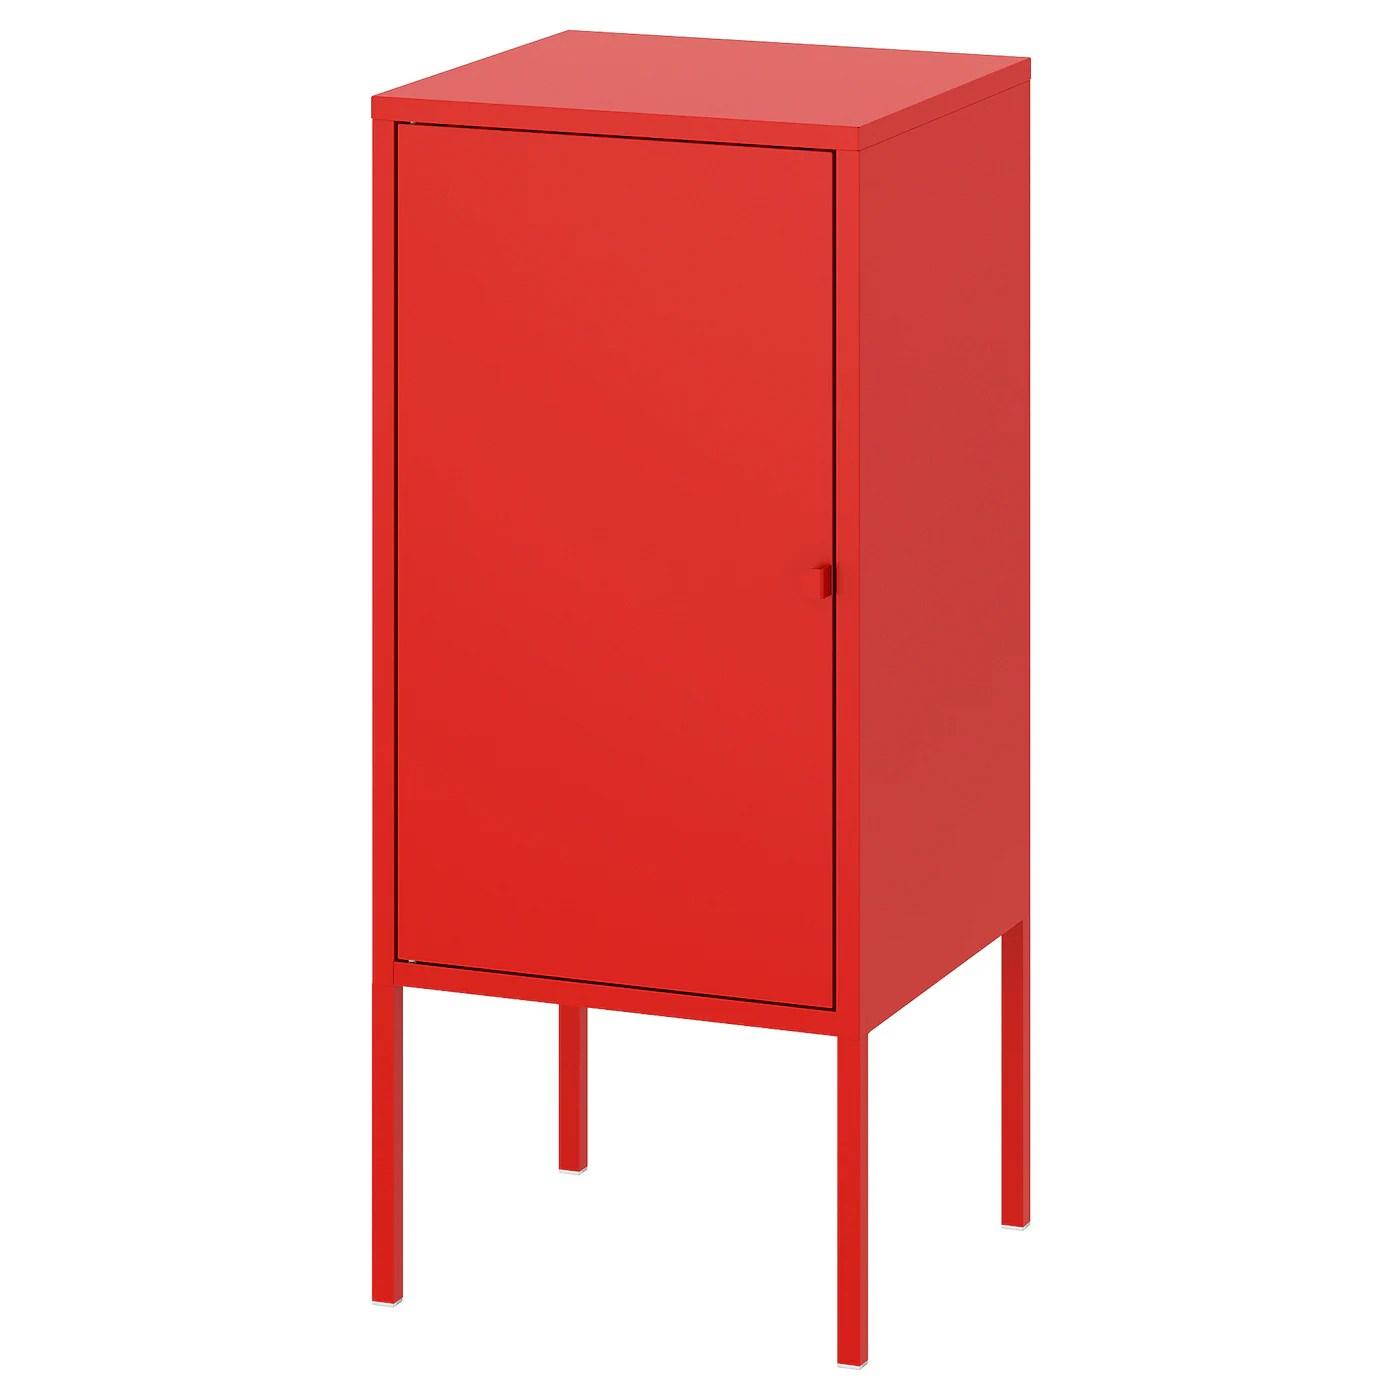 Lixhult Rangement Metal Rouge 35x60 Cm Ikea